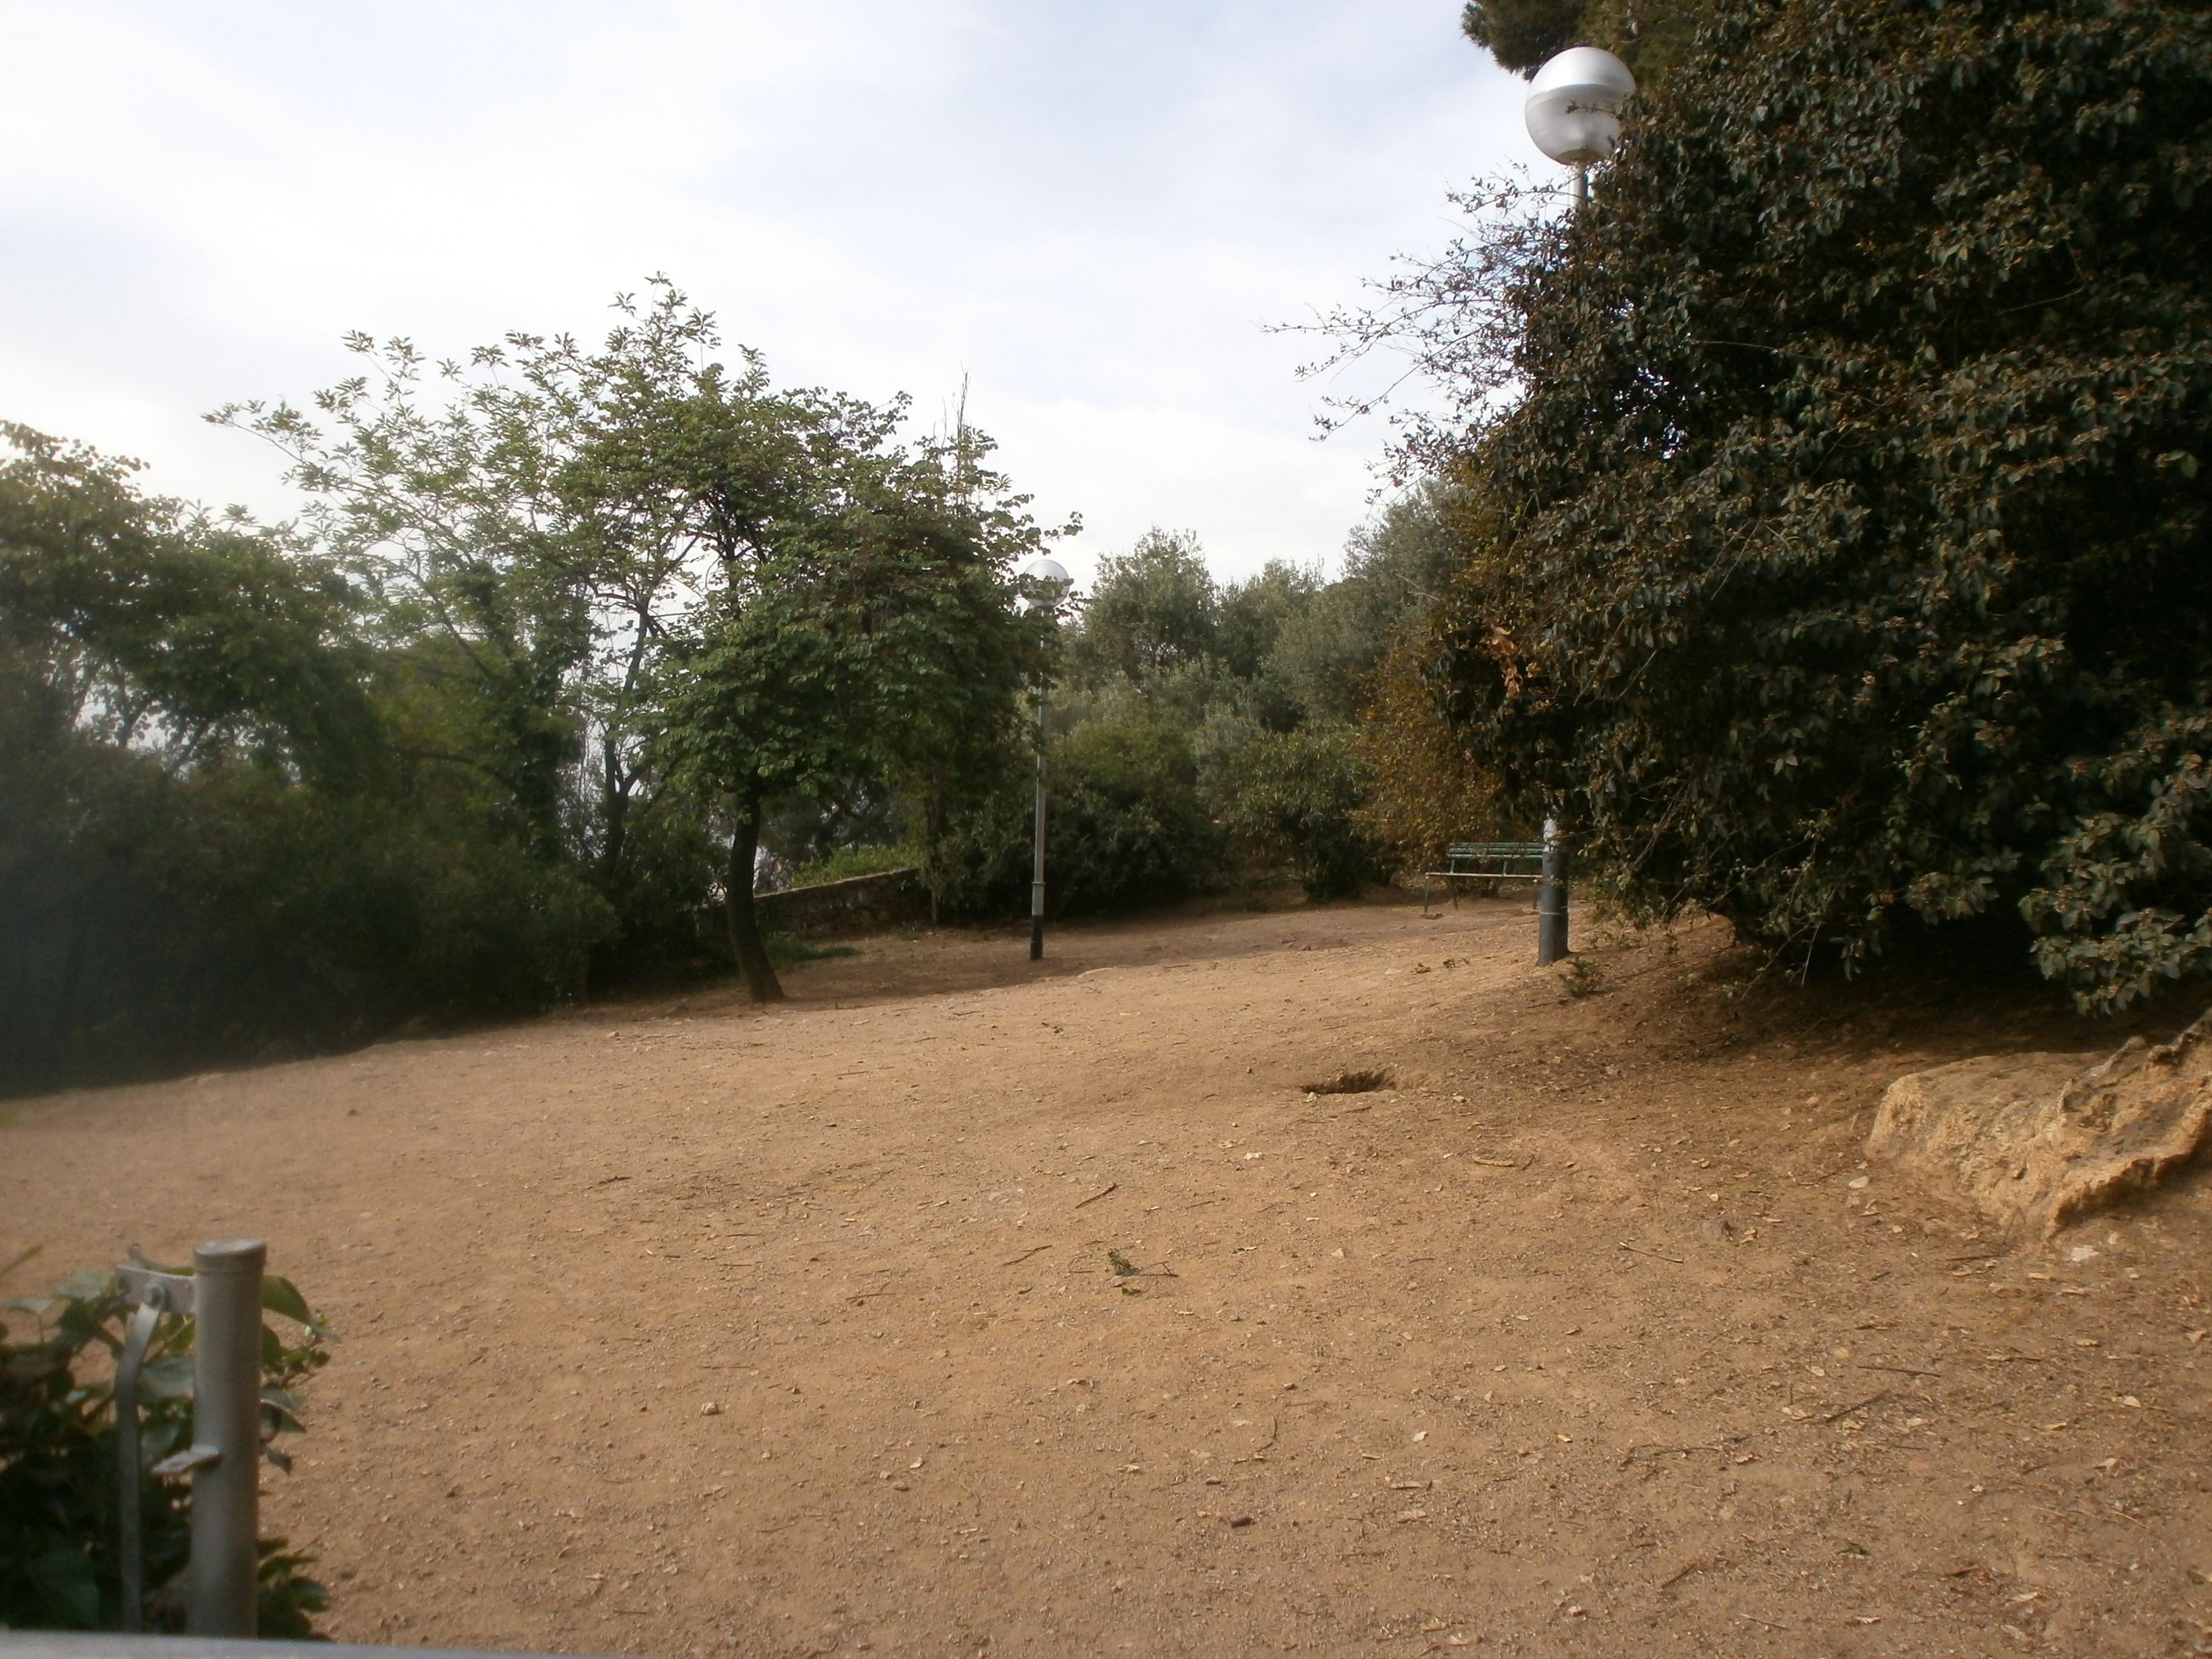 pipican-perro-barcelona-Pipican-Parc-del-Putxet